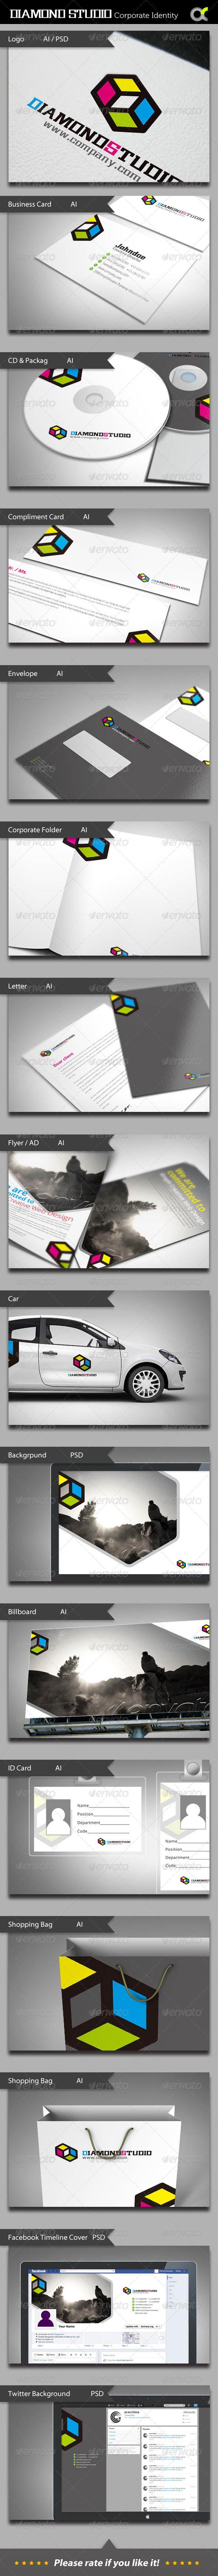 GraphicRiver Diamond Studio Corporate Identity 5455972